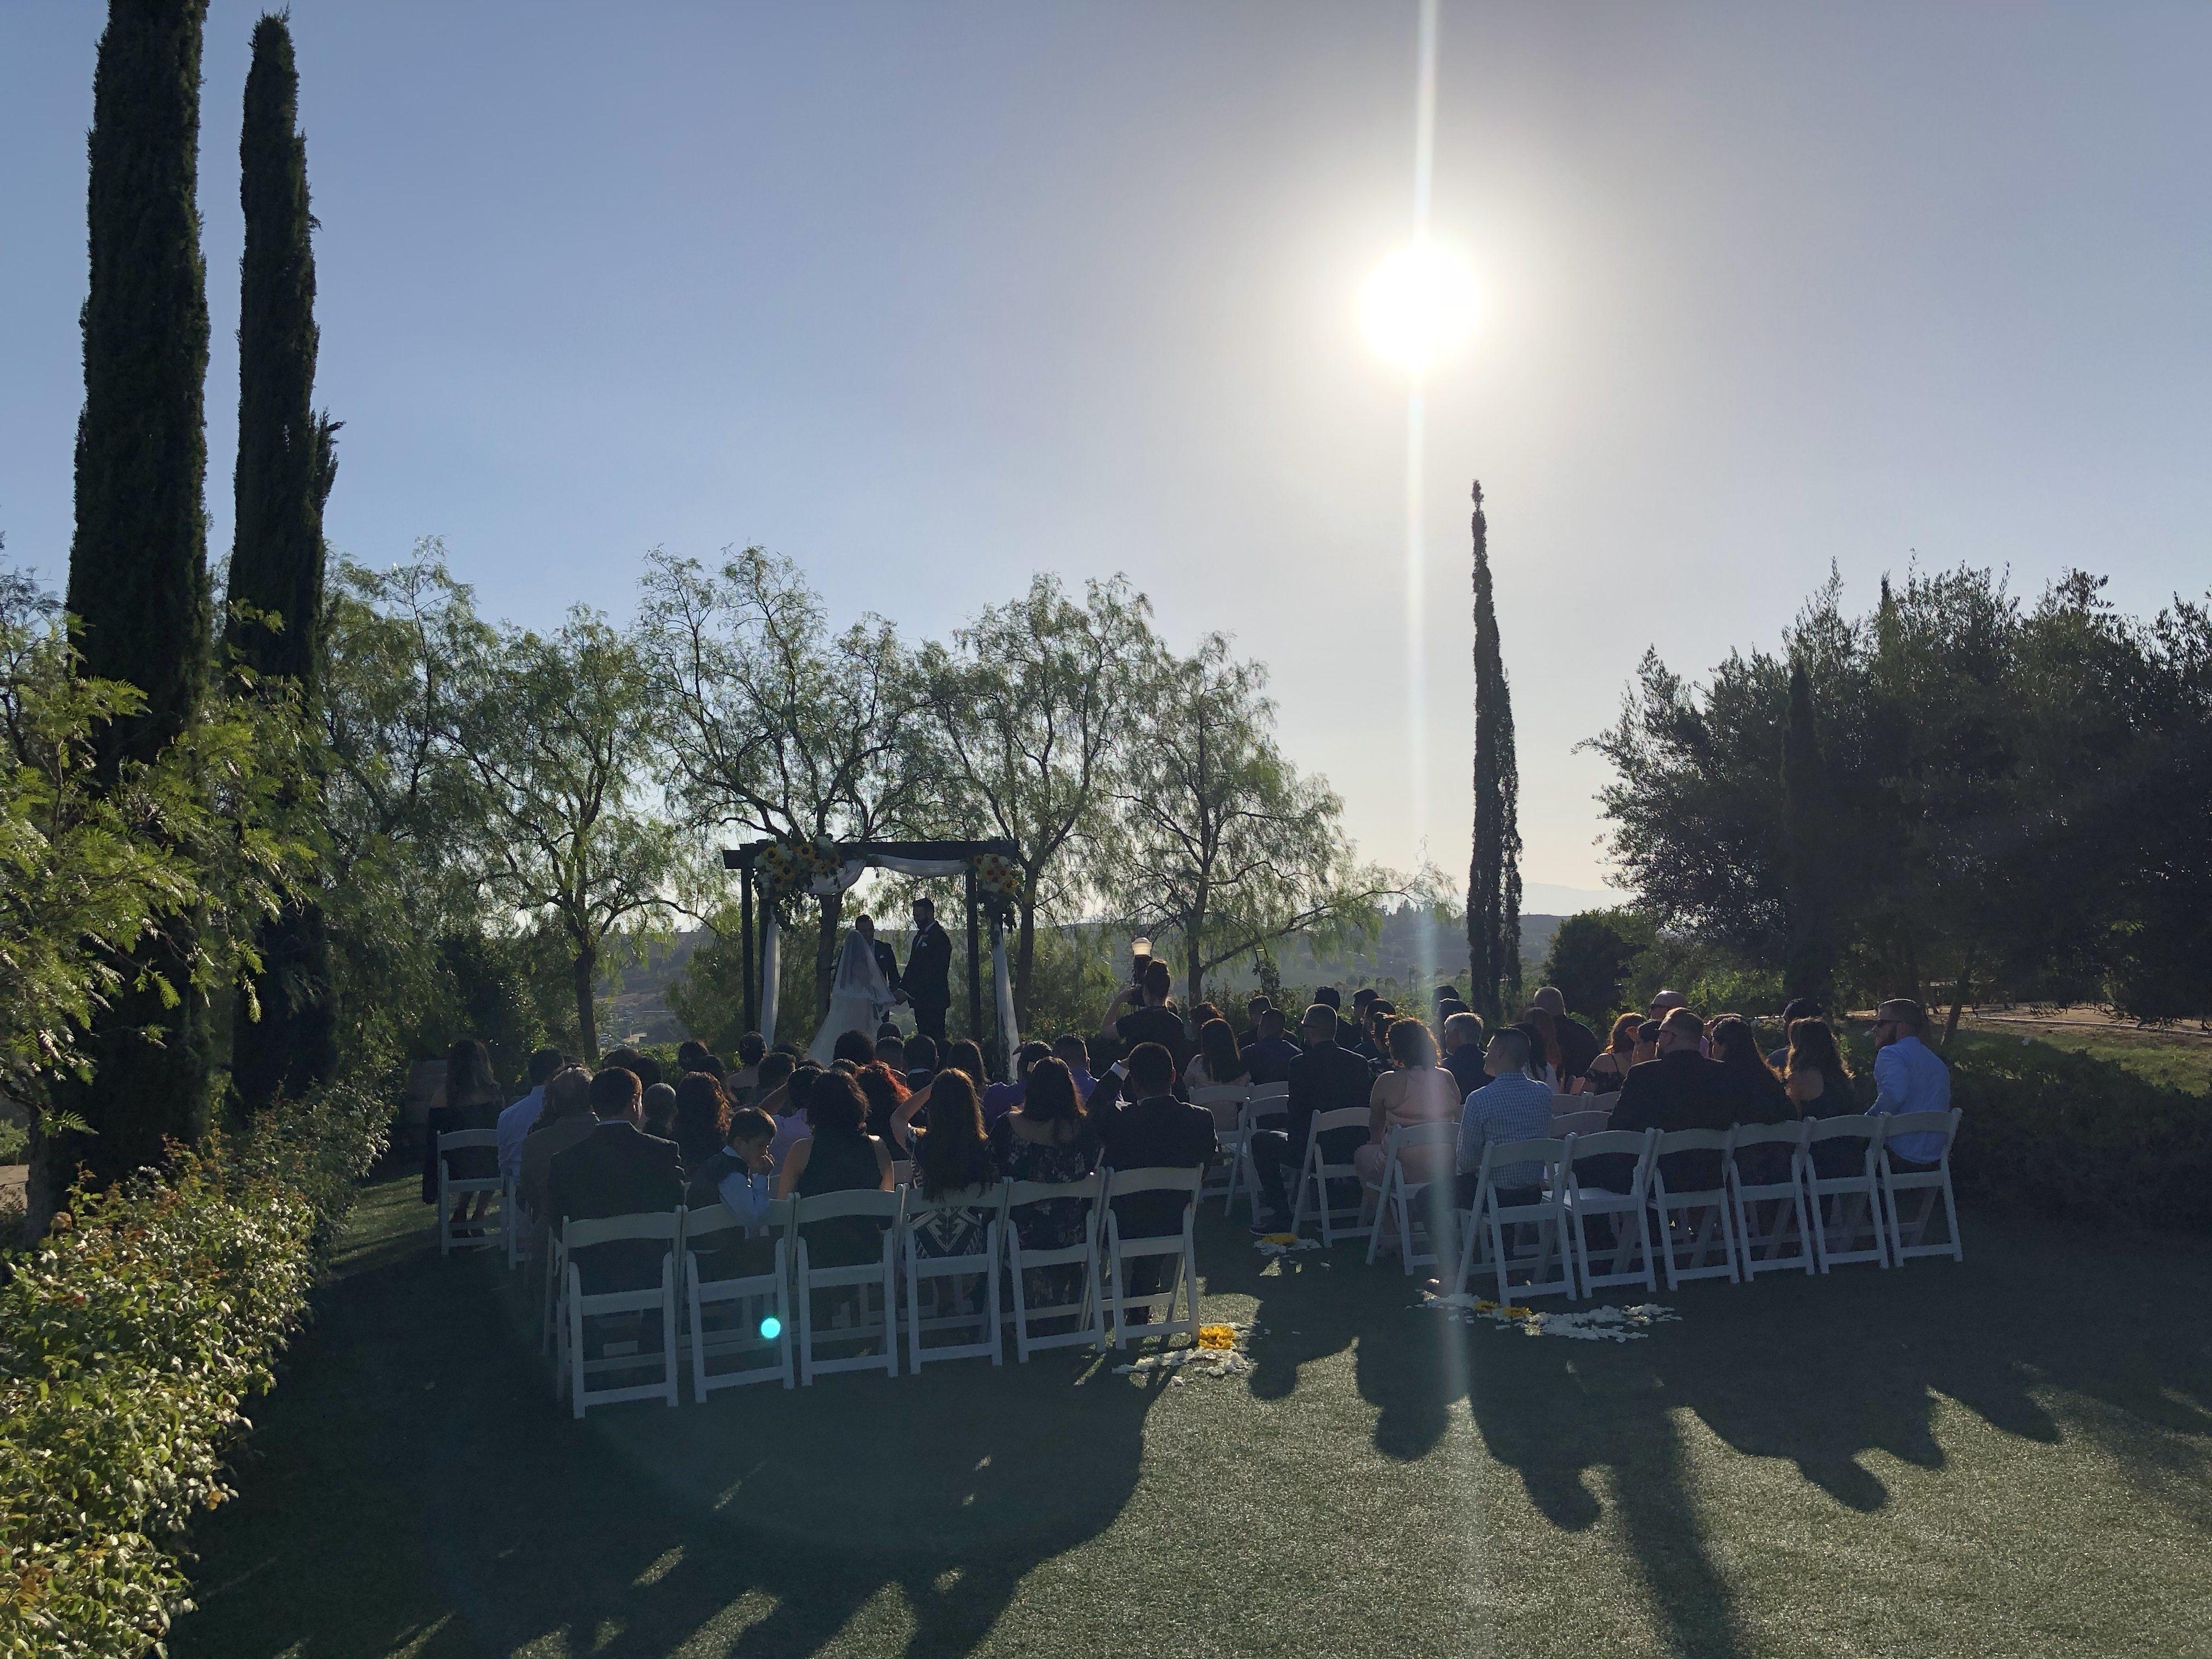 7.13.2018 Faulkner Winery Wedding